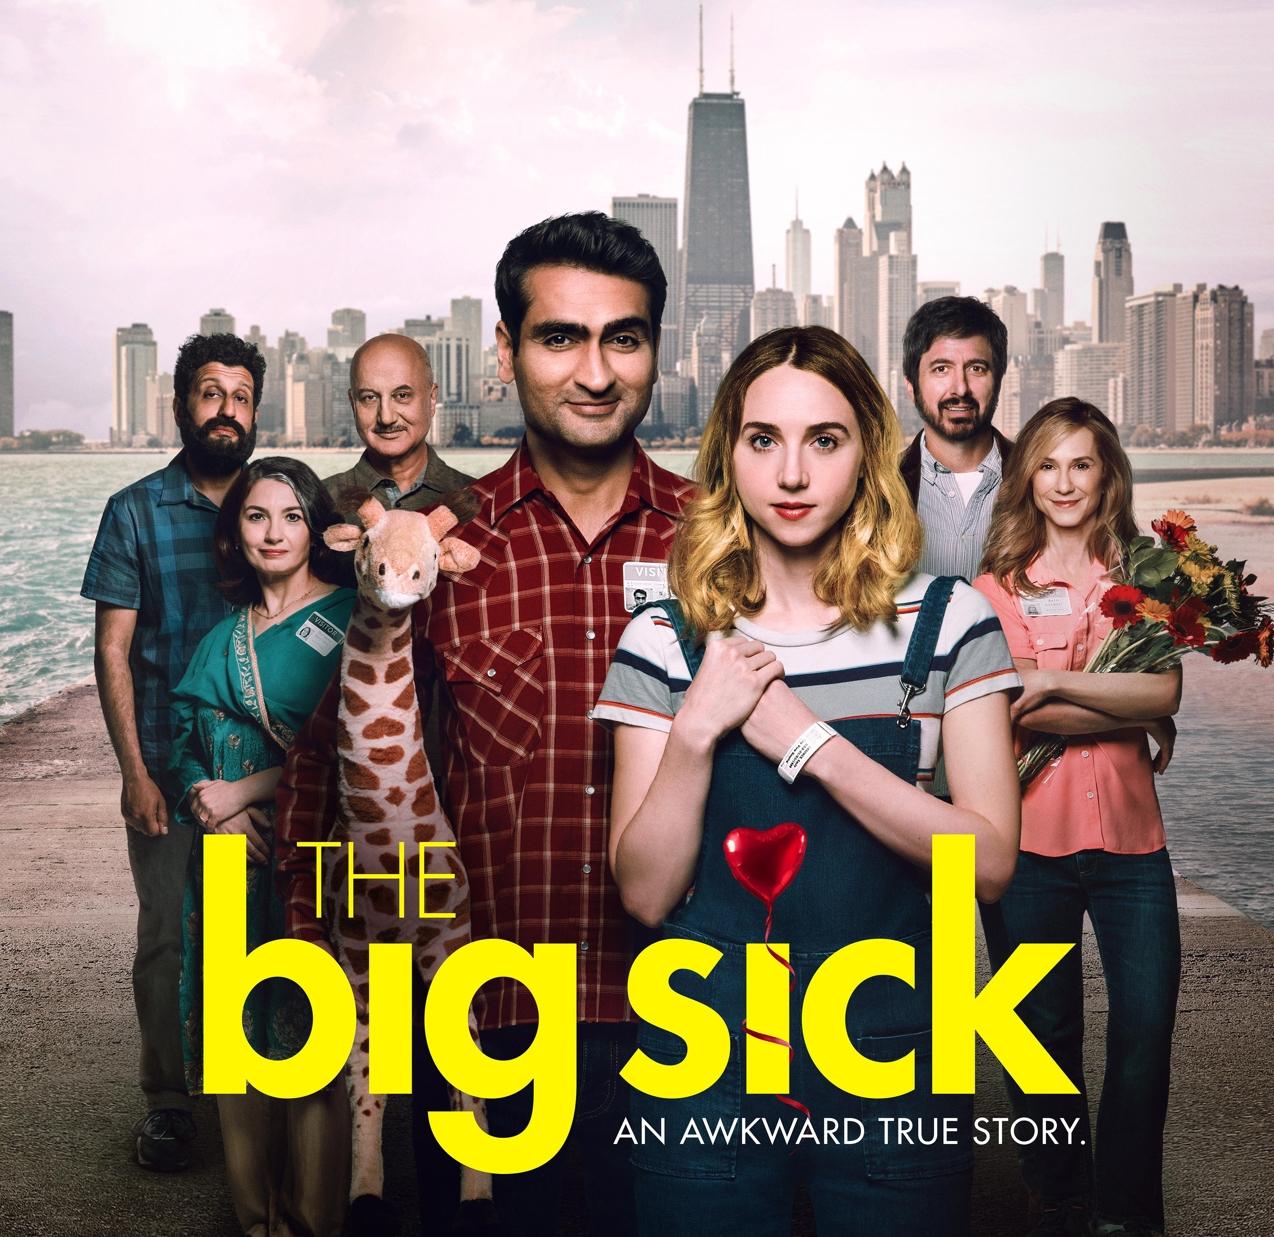 the_big_sick_one_sheet.jpg